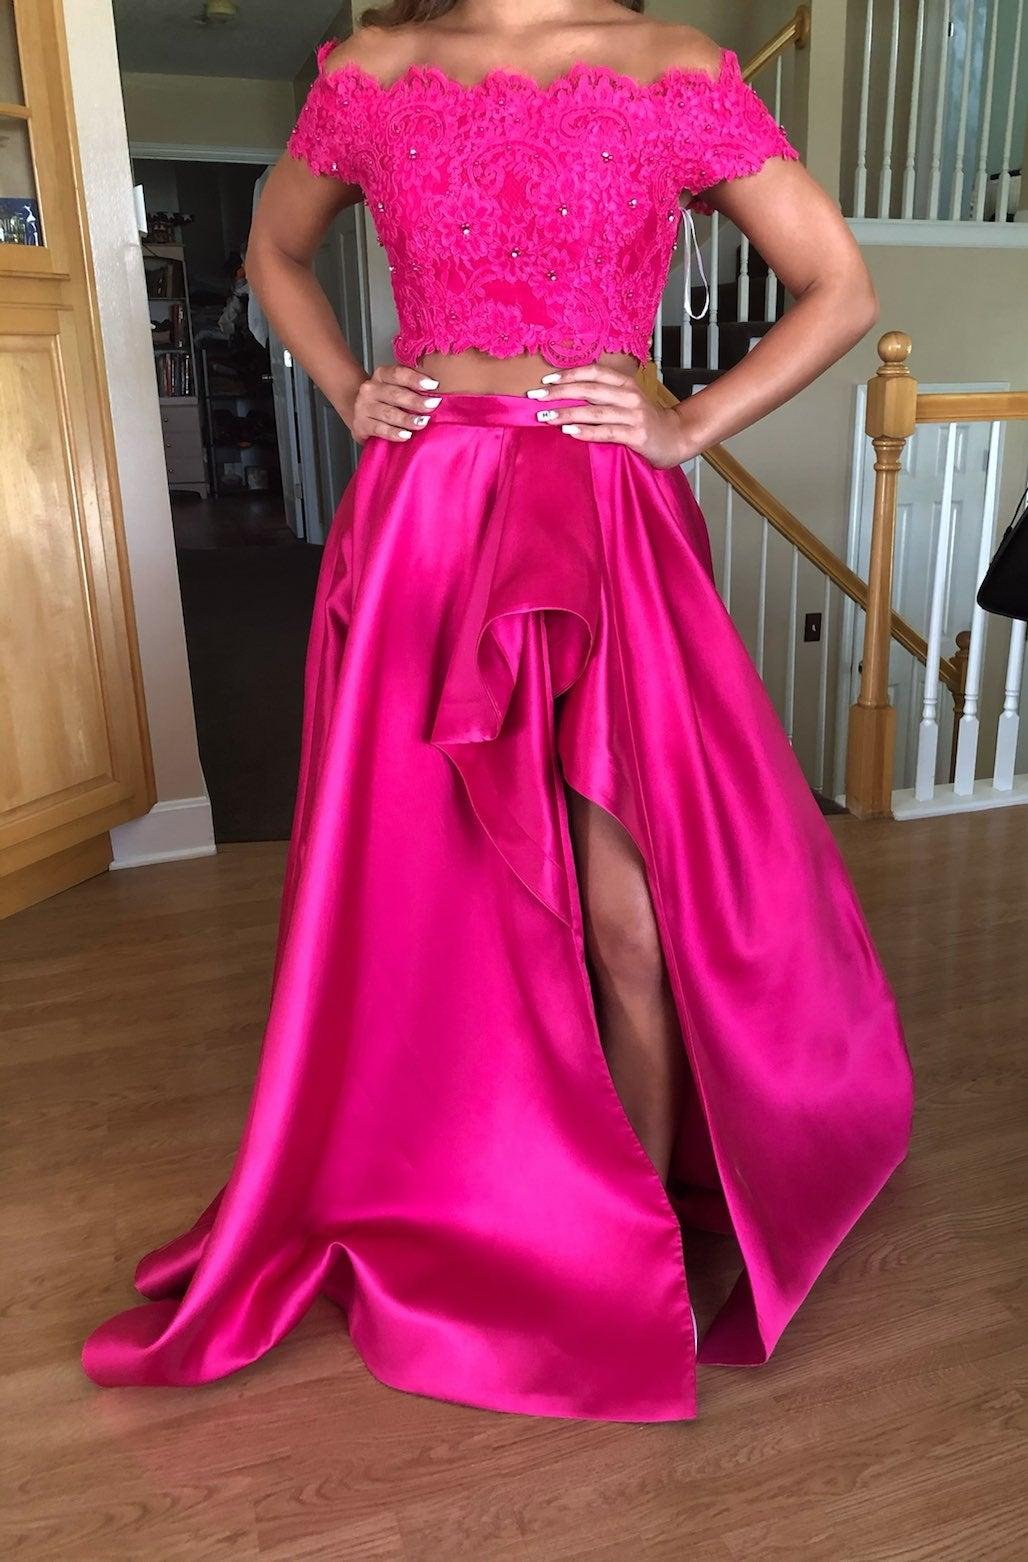 Hot pink Sherri Hill 2 piece formal ball